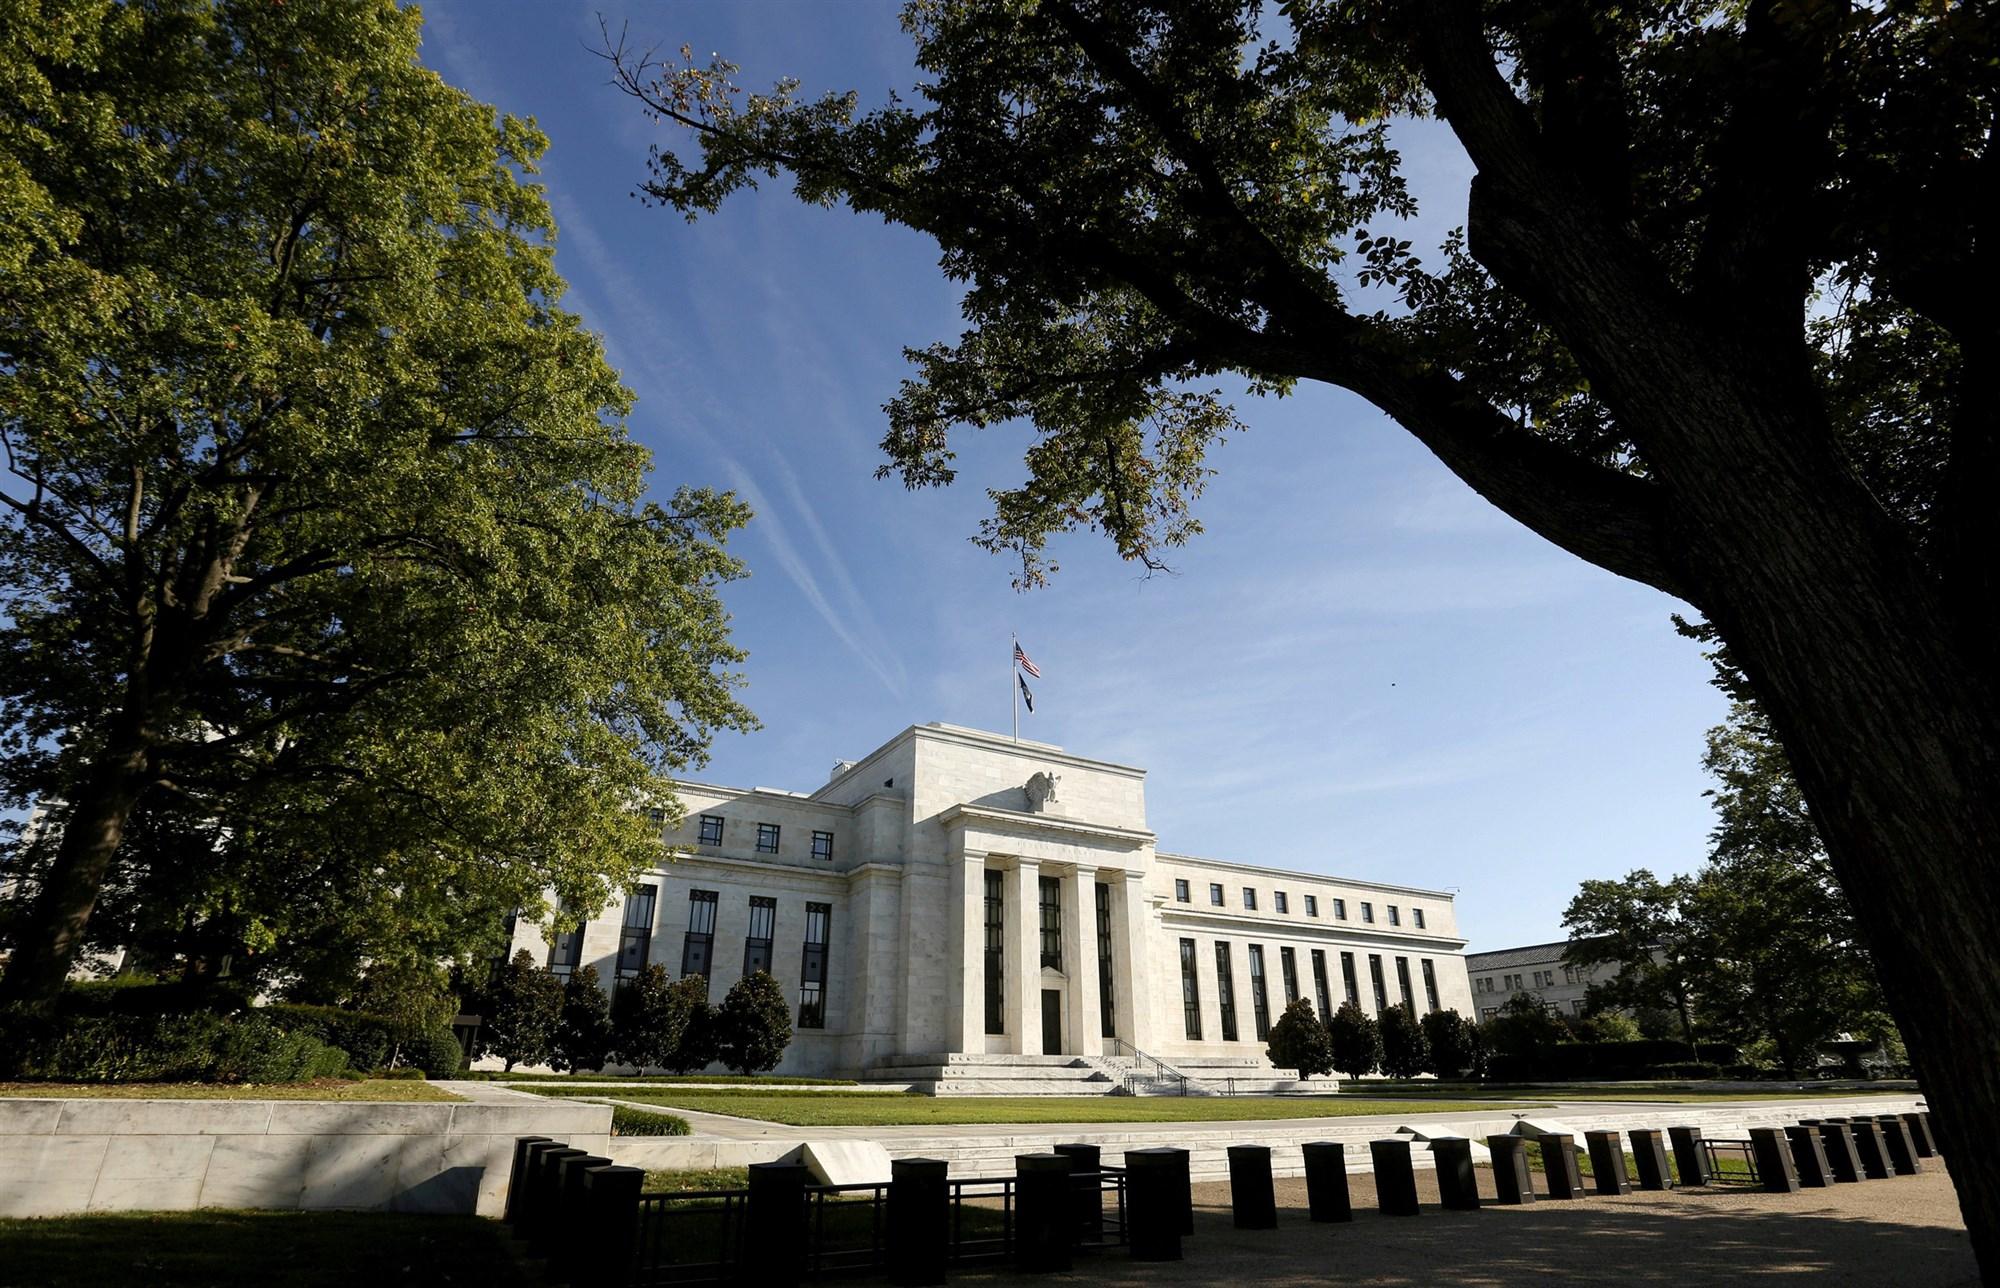 181116-federal-reserve-bank-washington-cs-1259p_dd6ec2e563c8e8524196e6f7d5634fce.fit-2000w_1542410595358.jpg